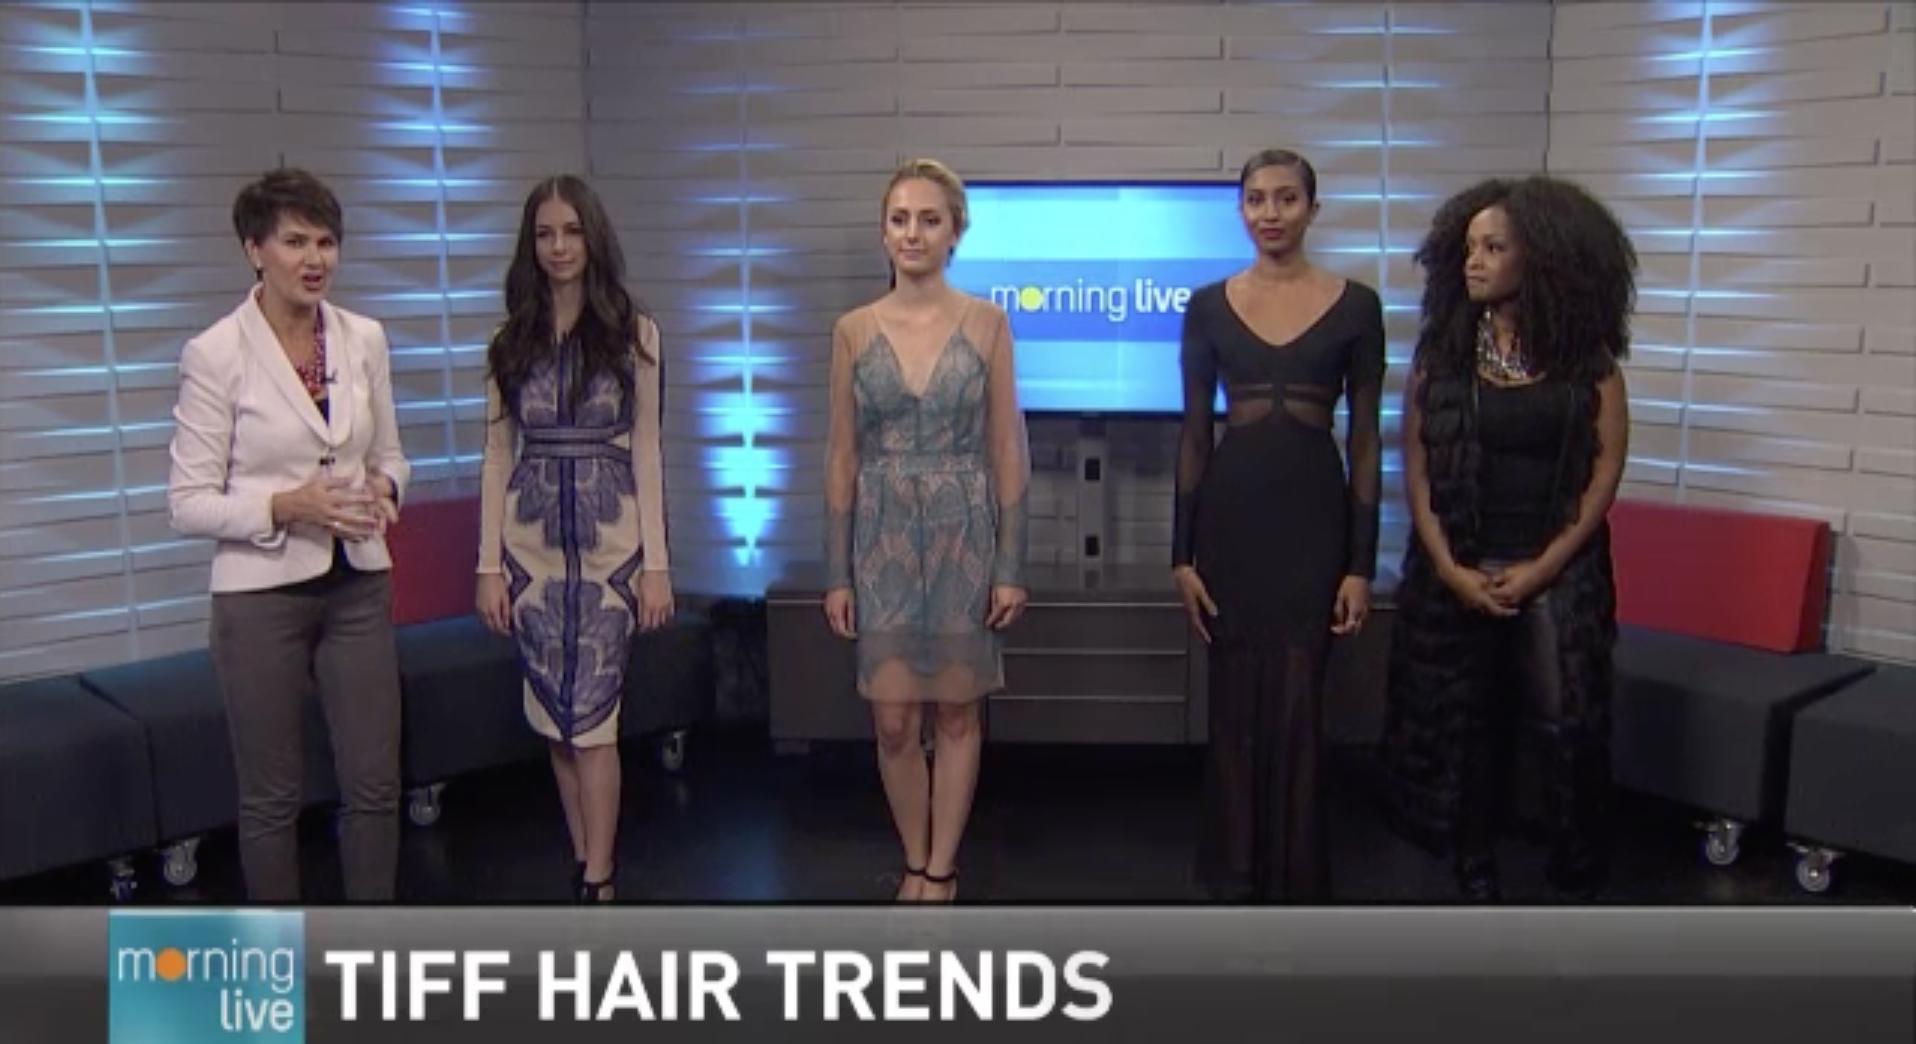 TIFF Hairstyles